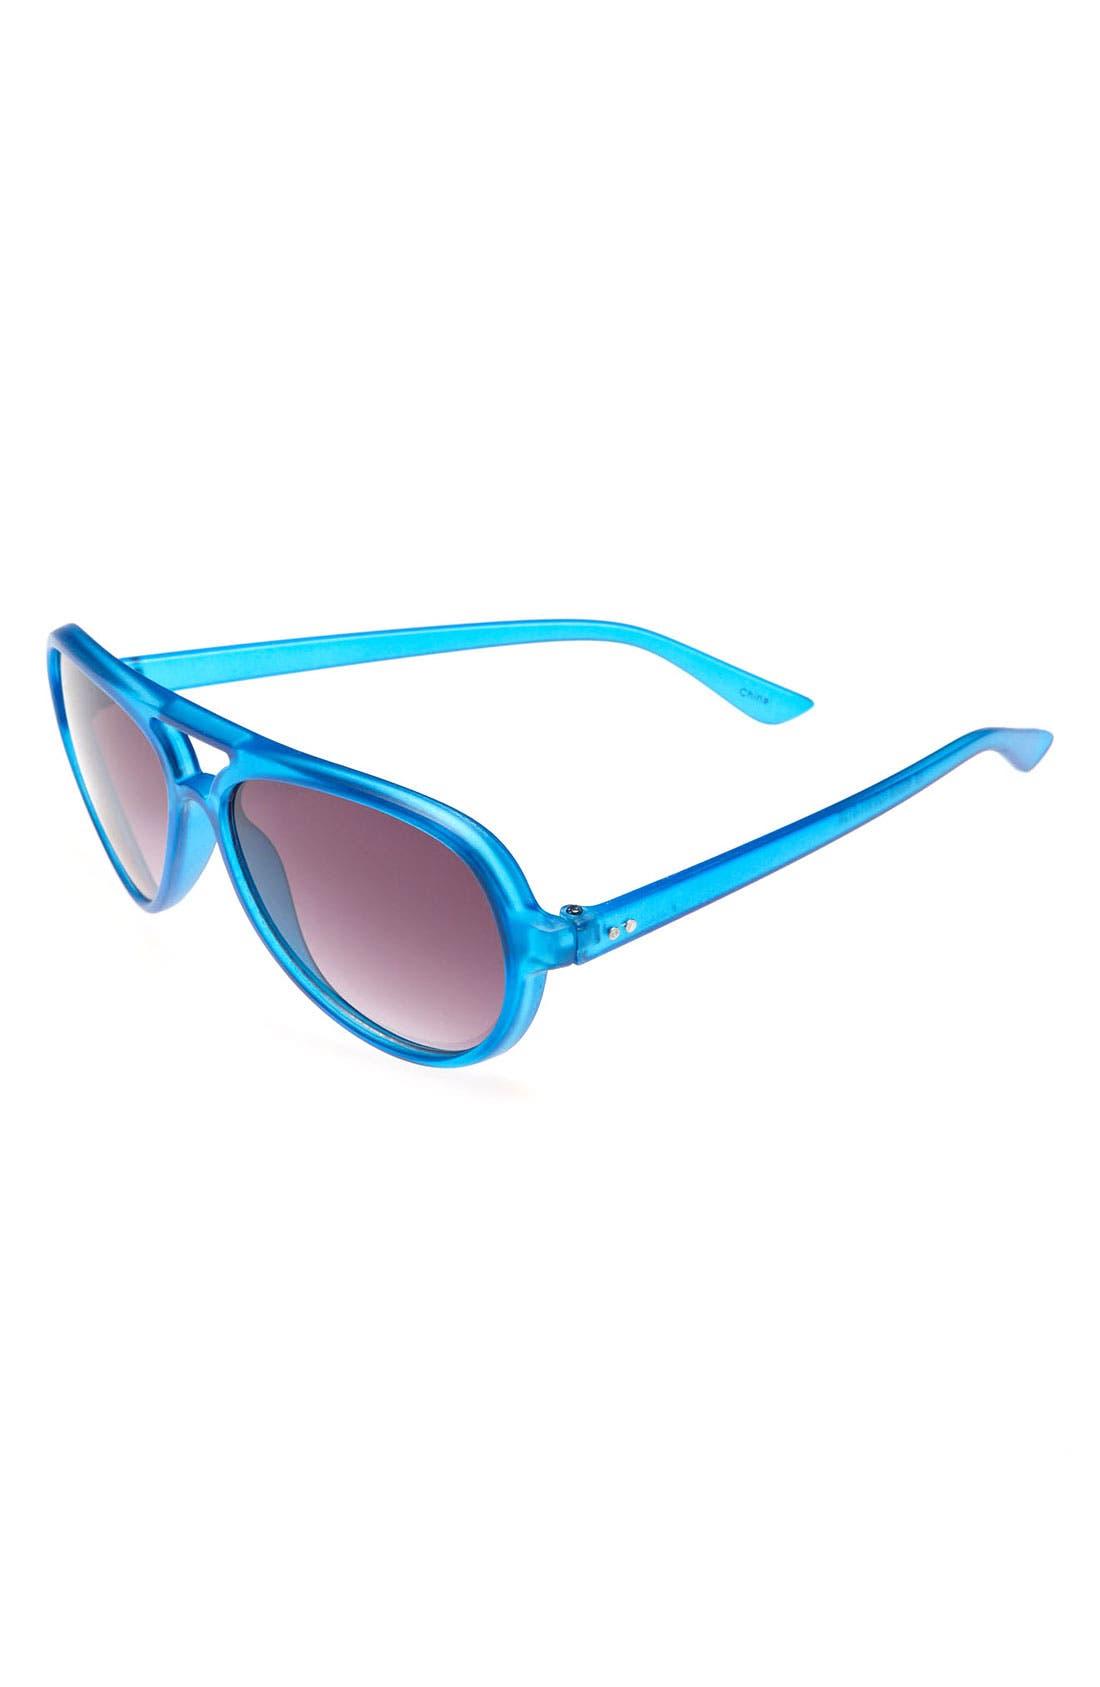 Main Image - Icon Eyewear Aviator Sunglasses (Boys)